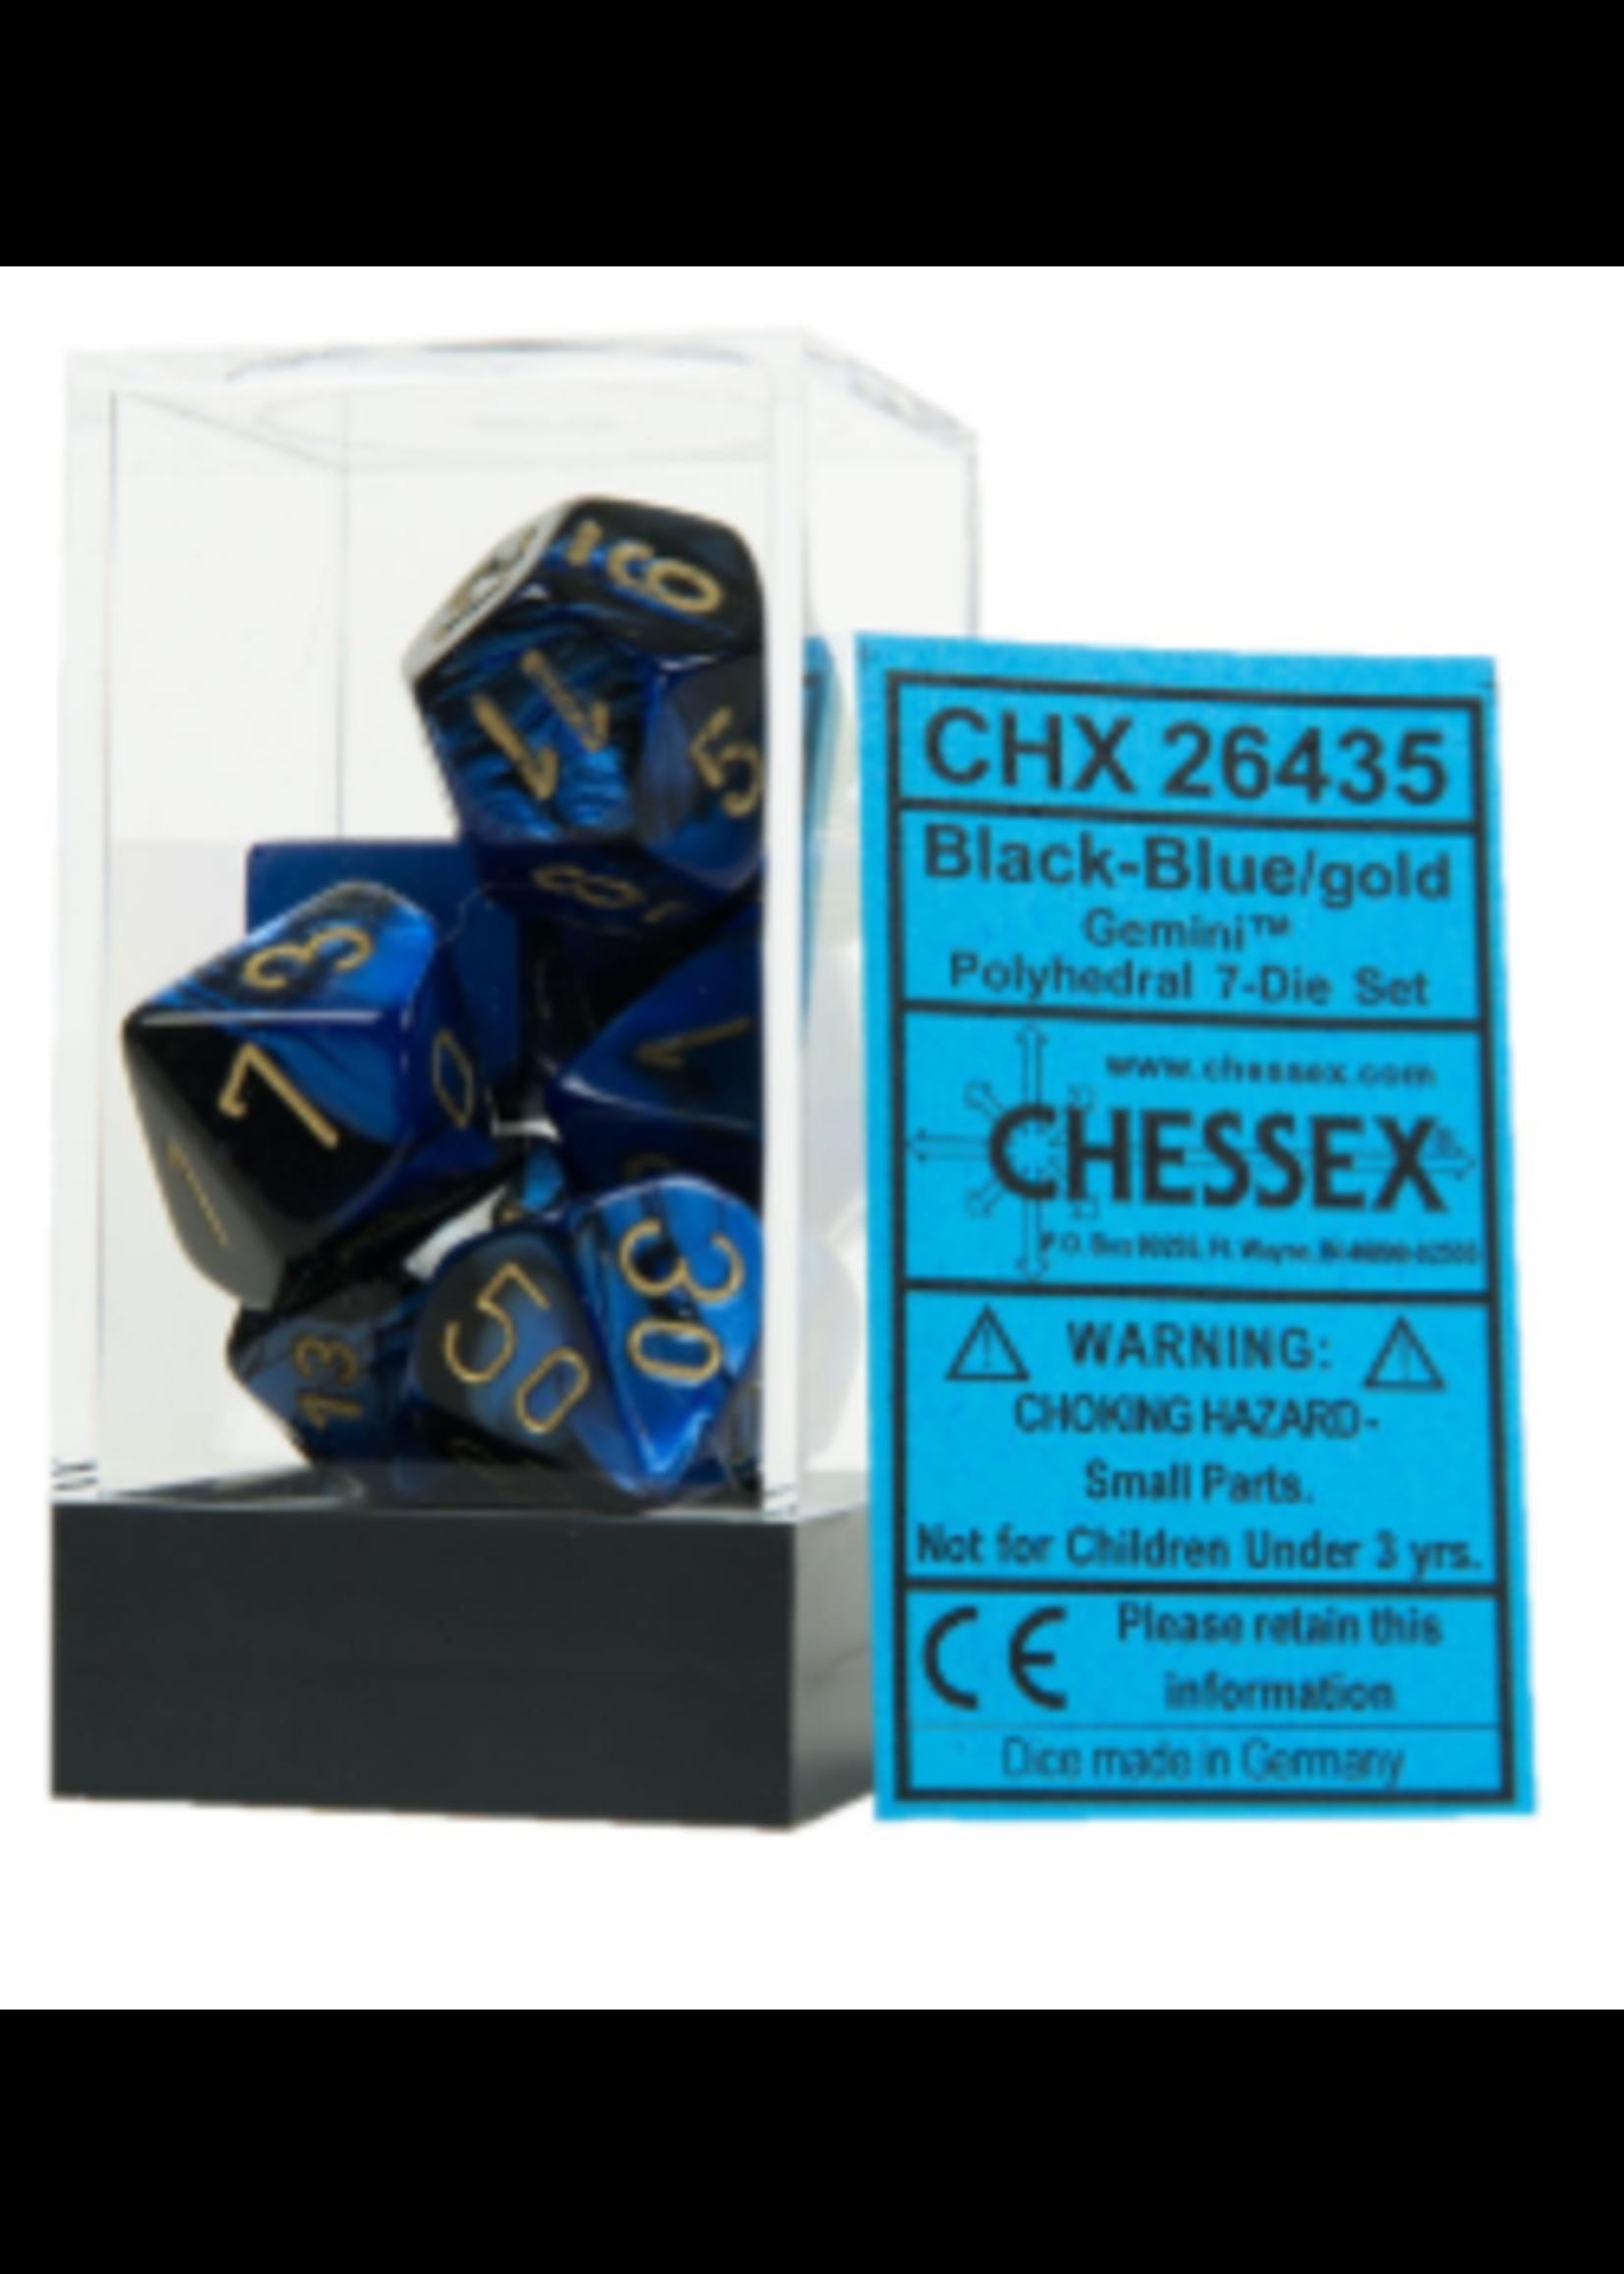 Chessex Gemini Poly 7 set: Black & Blue w/ Gold